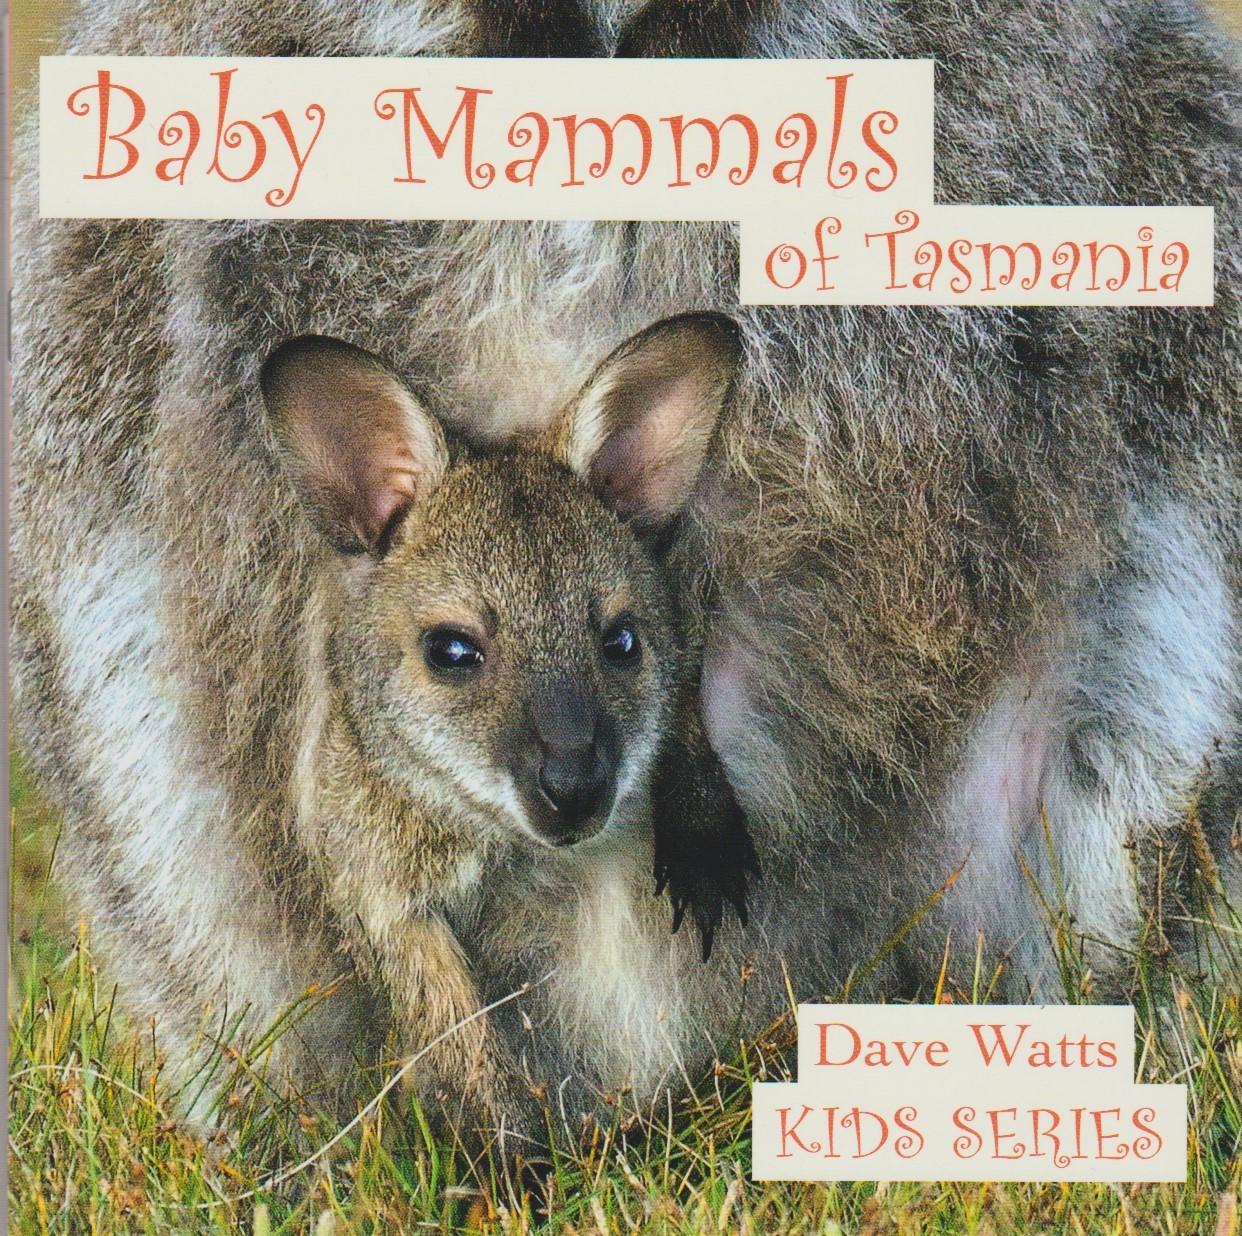 Baby Mammals of Tasmania - Kids Series